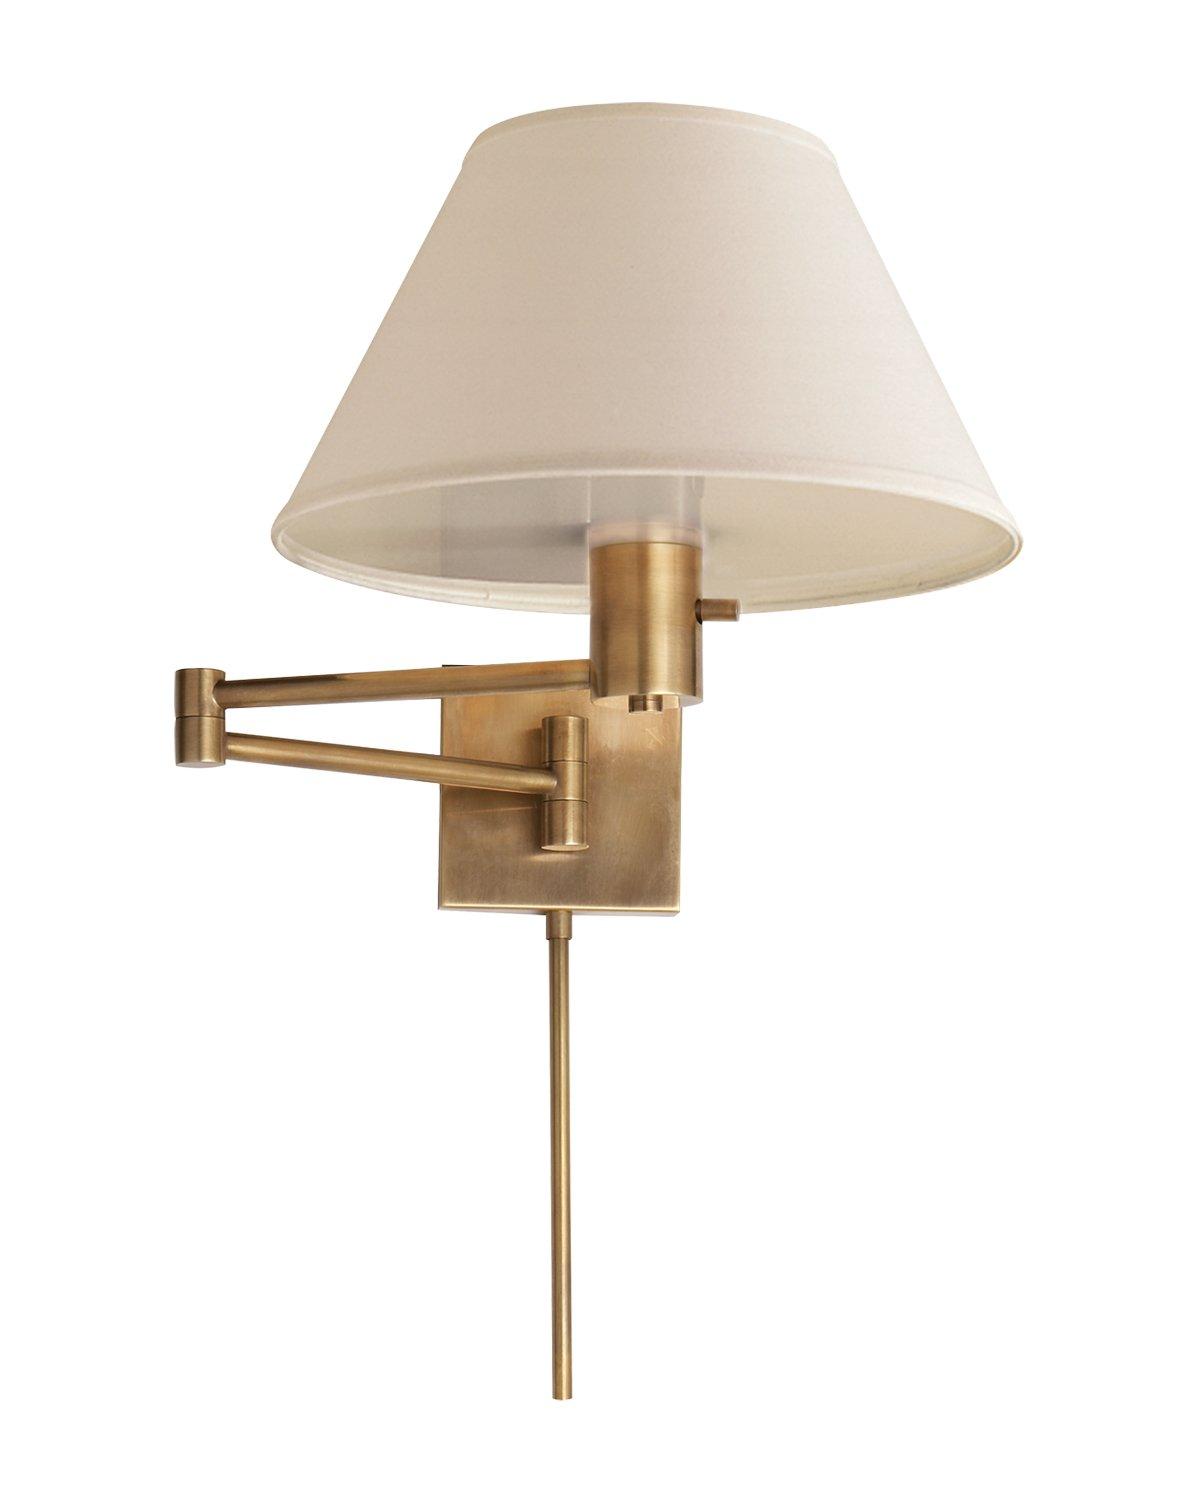 Classic_Swing_Arm_Wall_Lamp_4.jpg